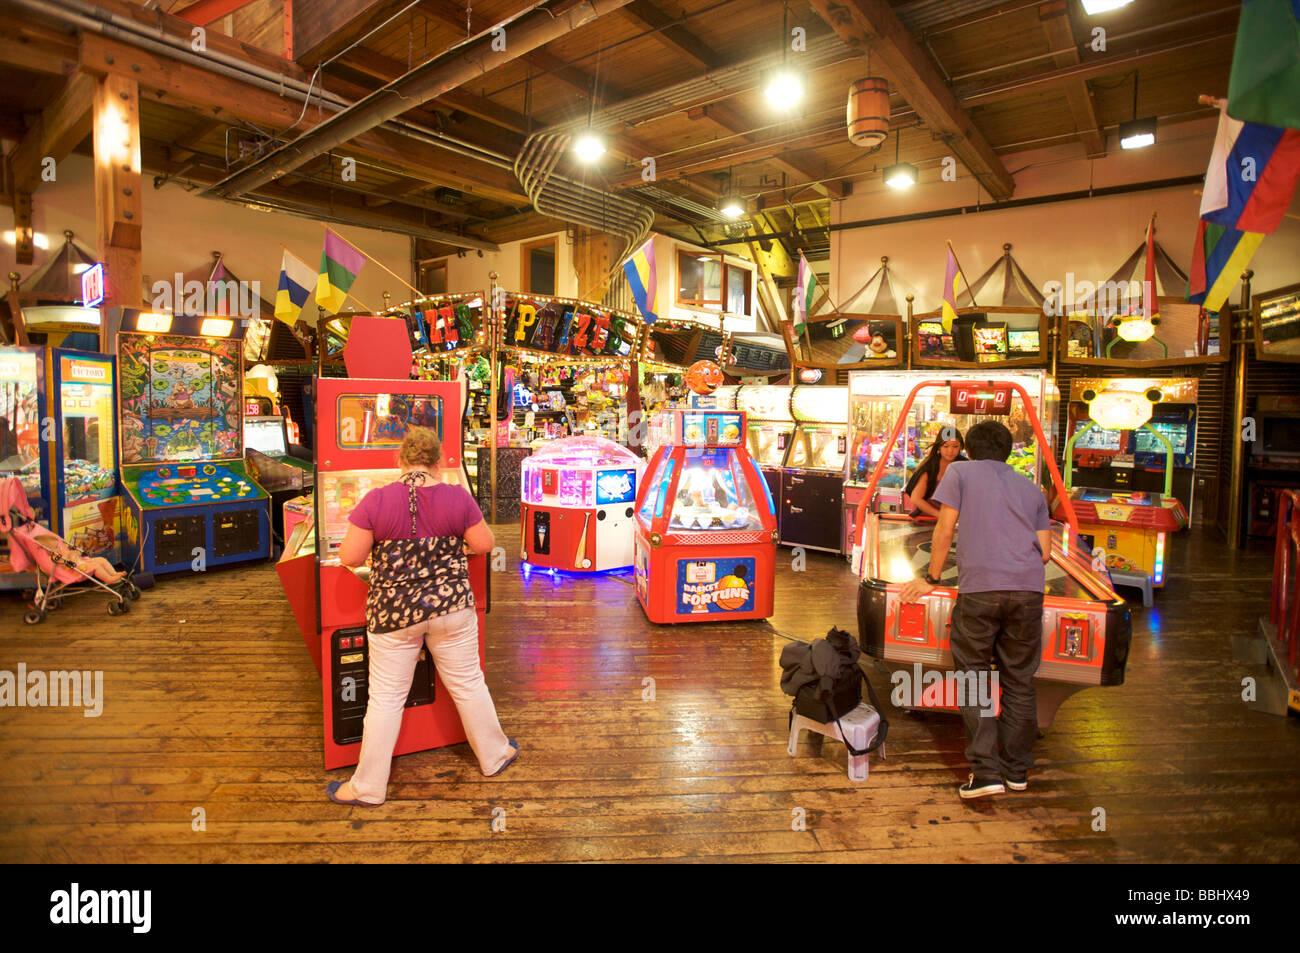 Video game and Penny arcade, Fisherman's Wharf, Seattle WA, USA - Stock Image